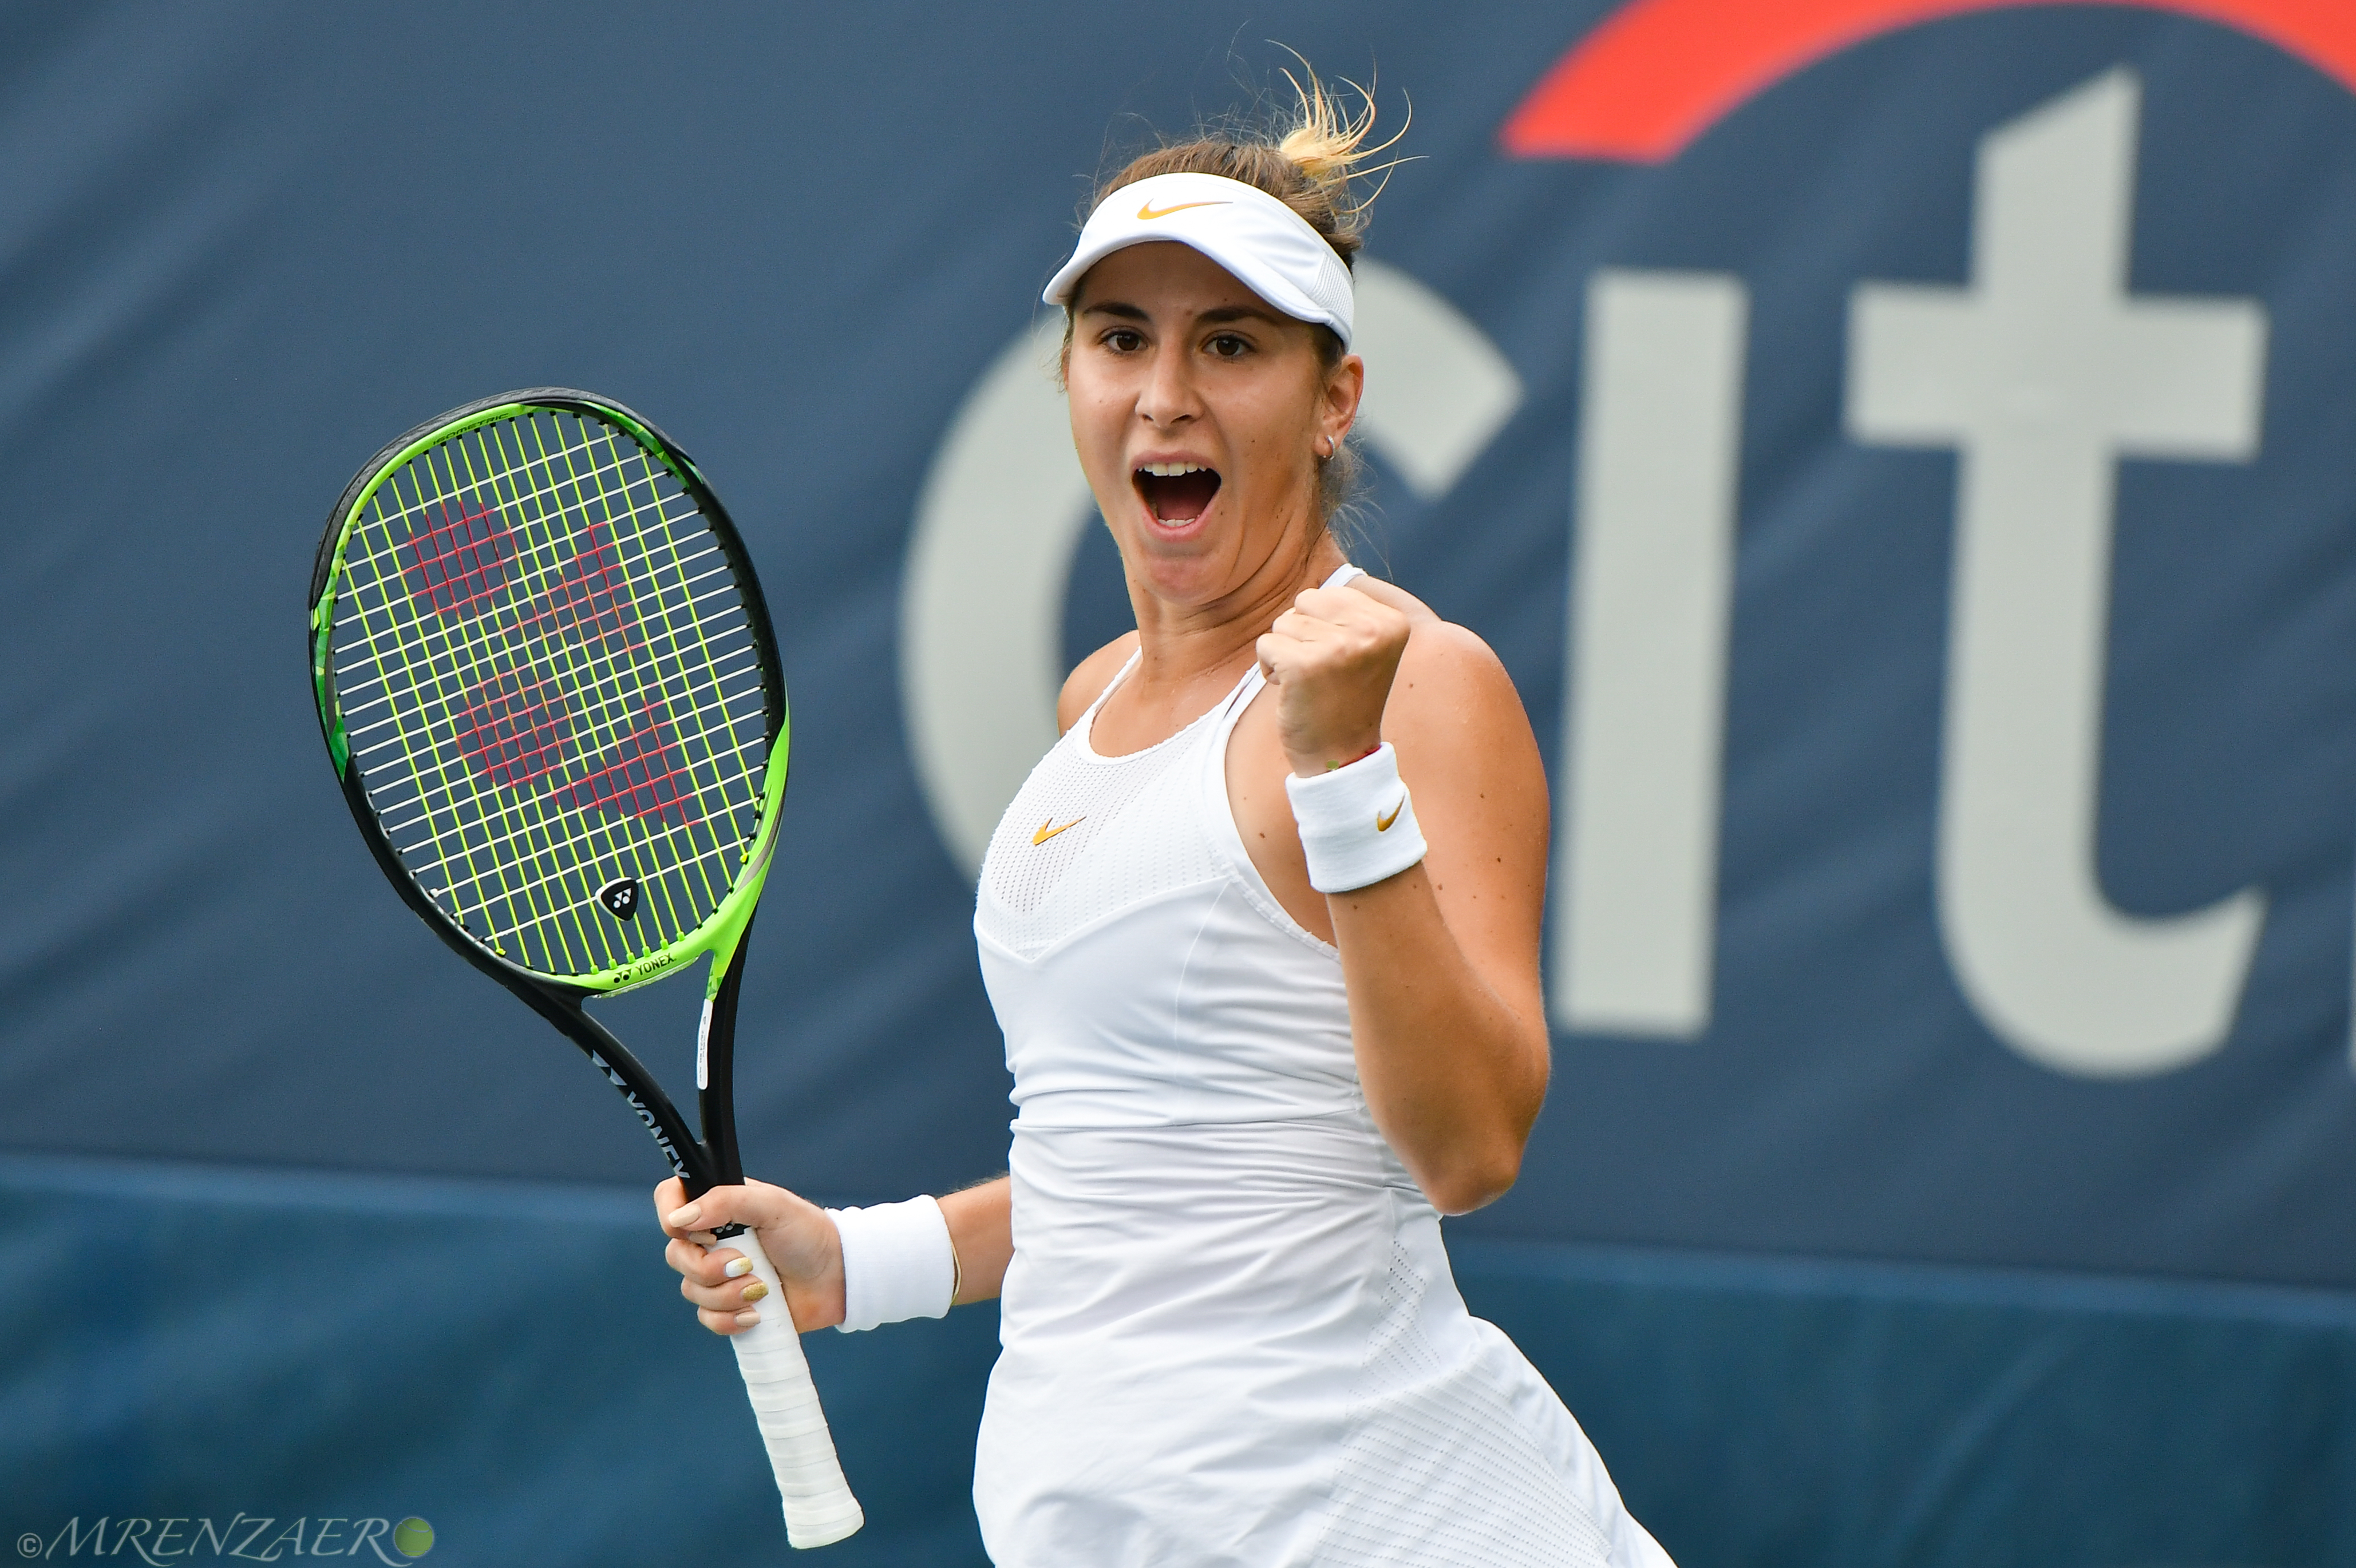 Belinda Bencic, 2018 Citi Open (Photo: Mike Renz for Tennis Atlantic)